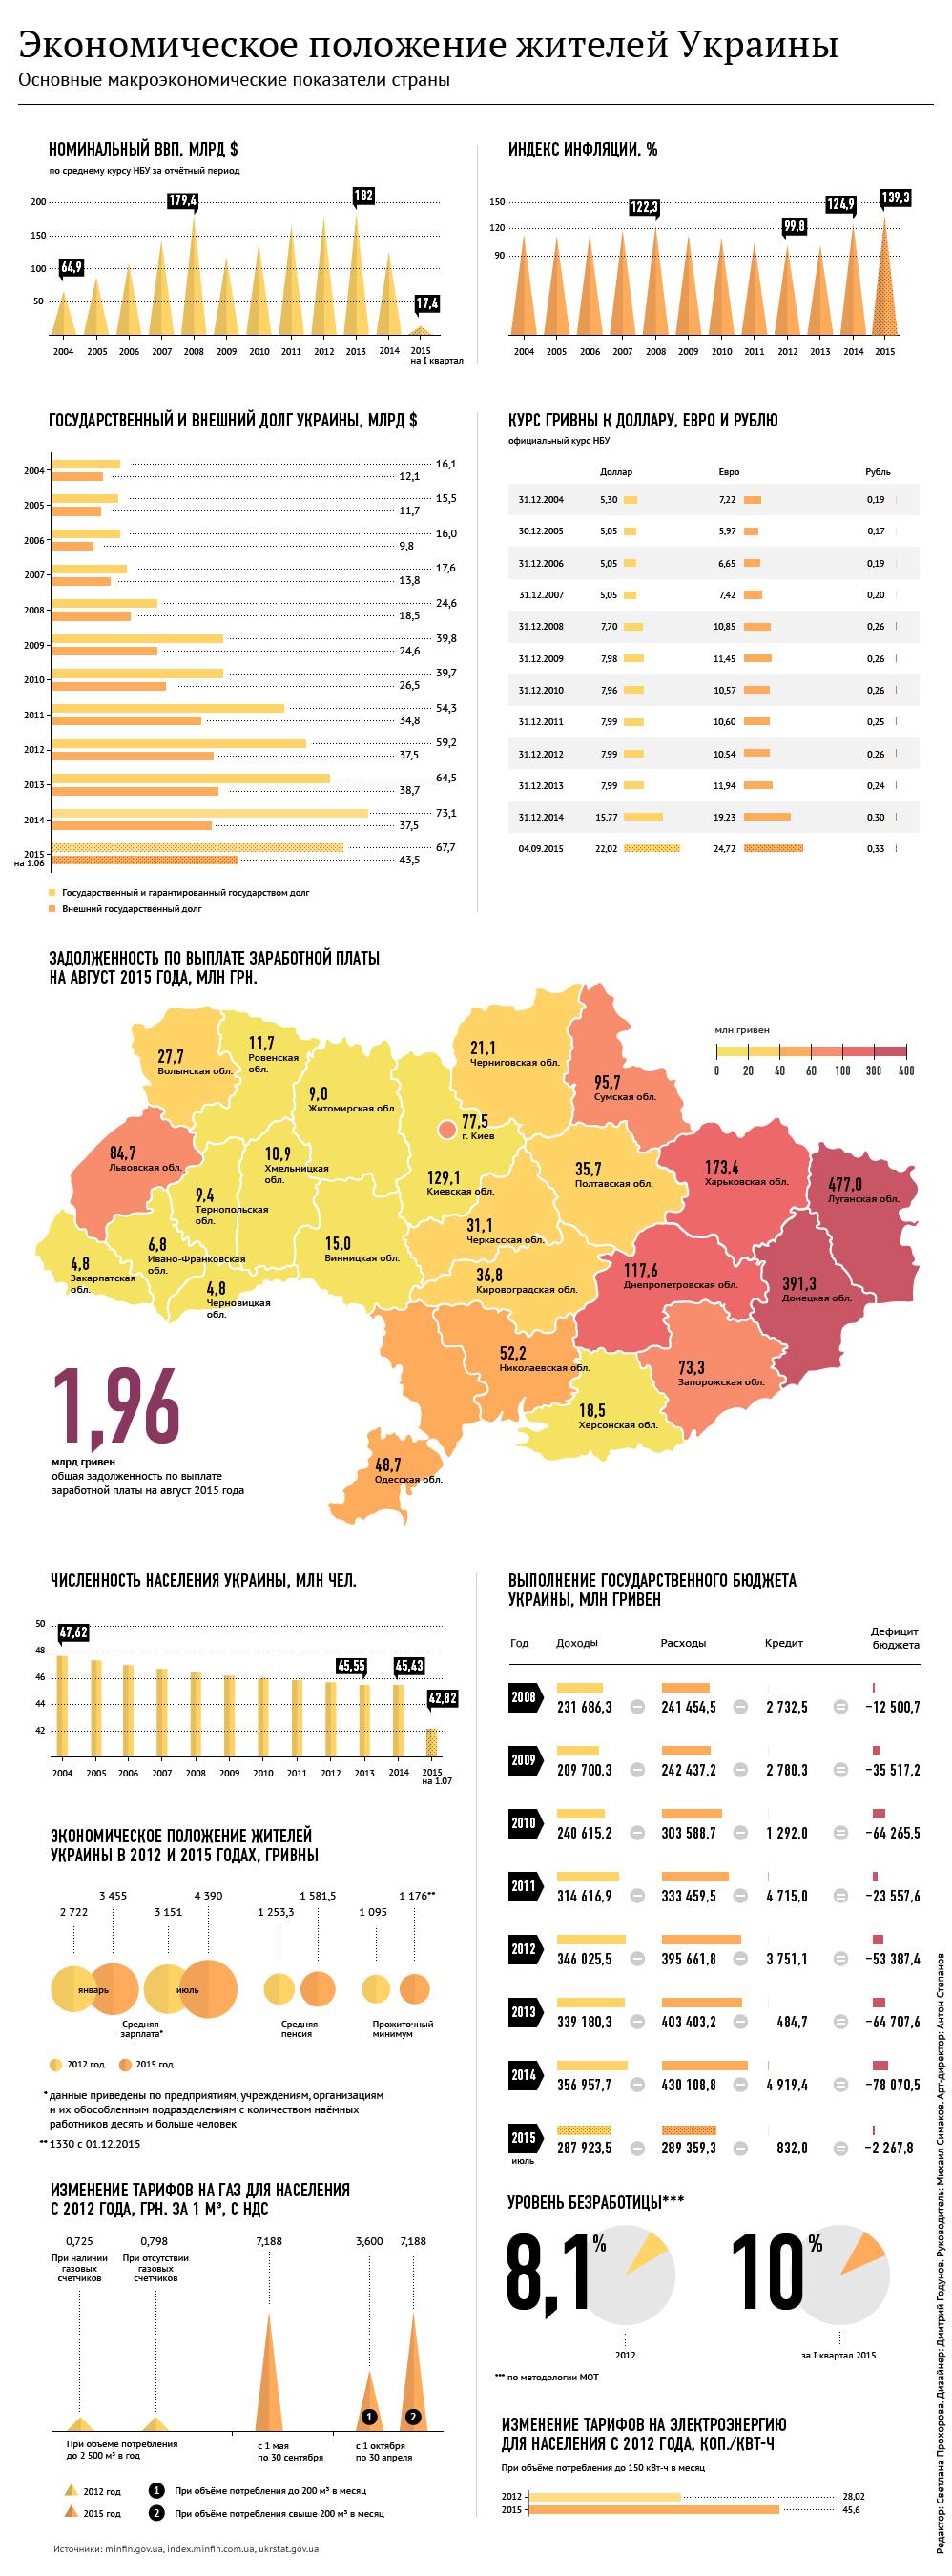 Депутат Рады: Яценюк и Яресько забирают у нас последнюю рубашку